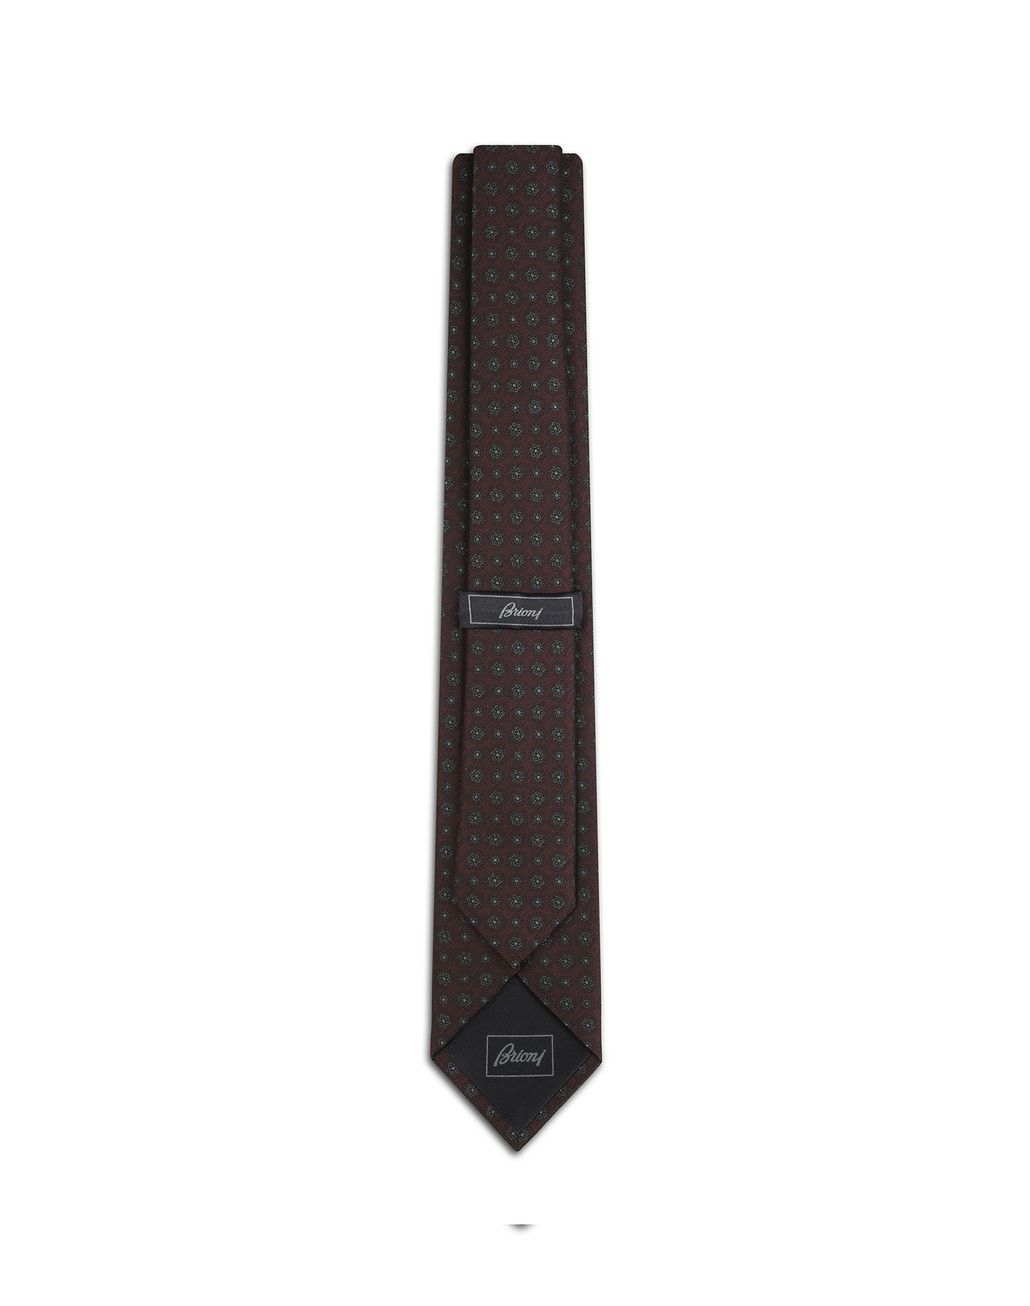 BRIONI Krawatte in der Farbe Amaranth mit großem Muster Krawatte [*** pickupInStoreShippingNotGuaranteed_info ***] r